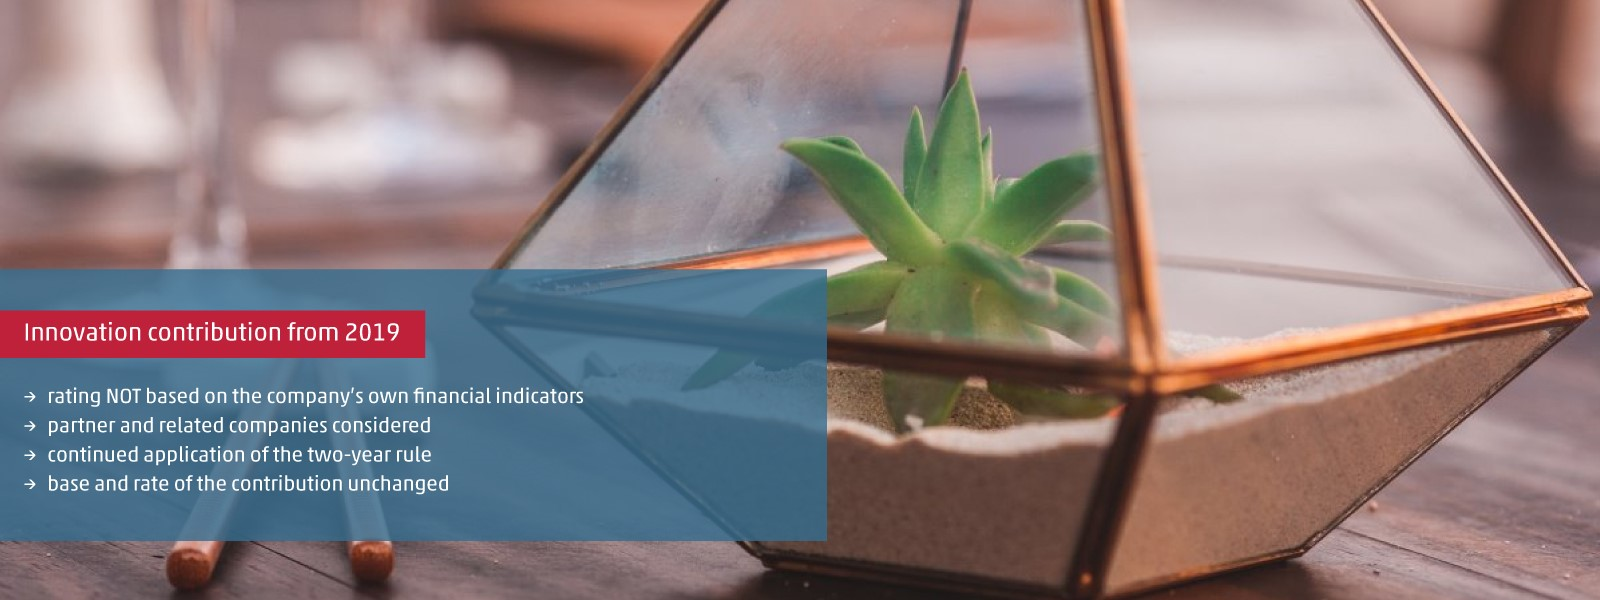 innovation-contribution-2019